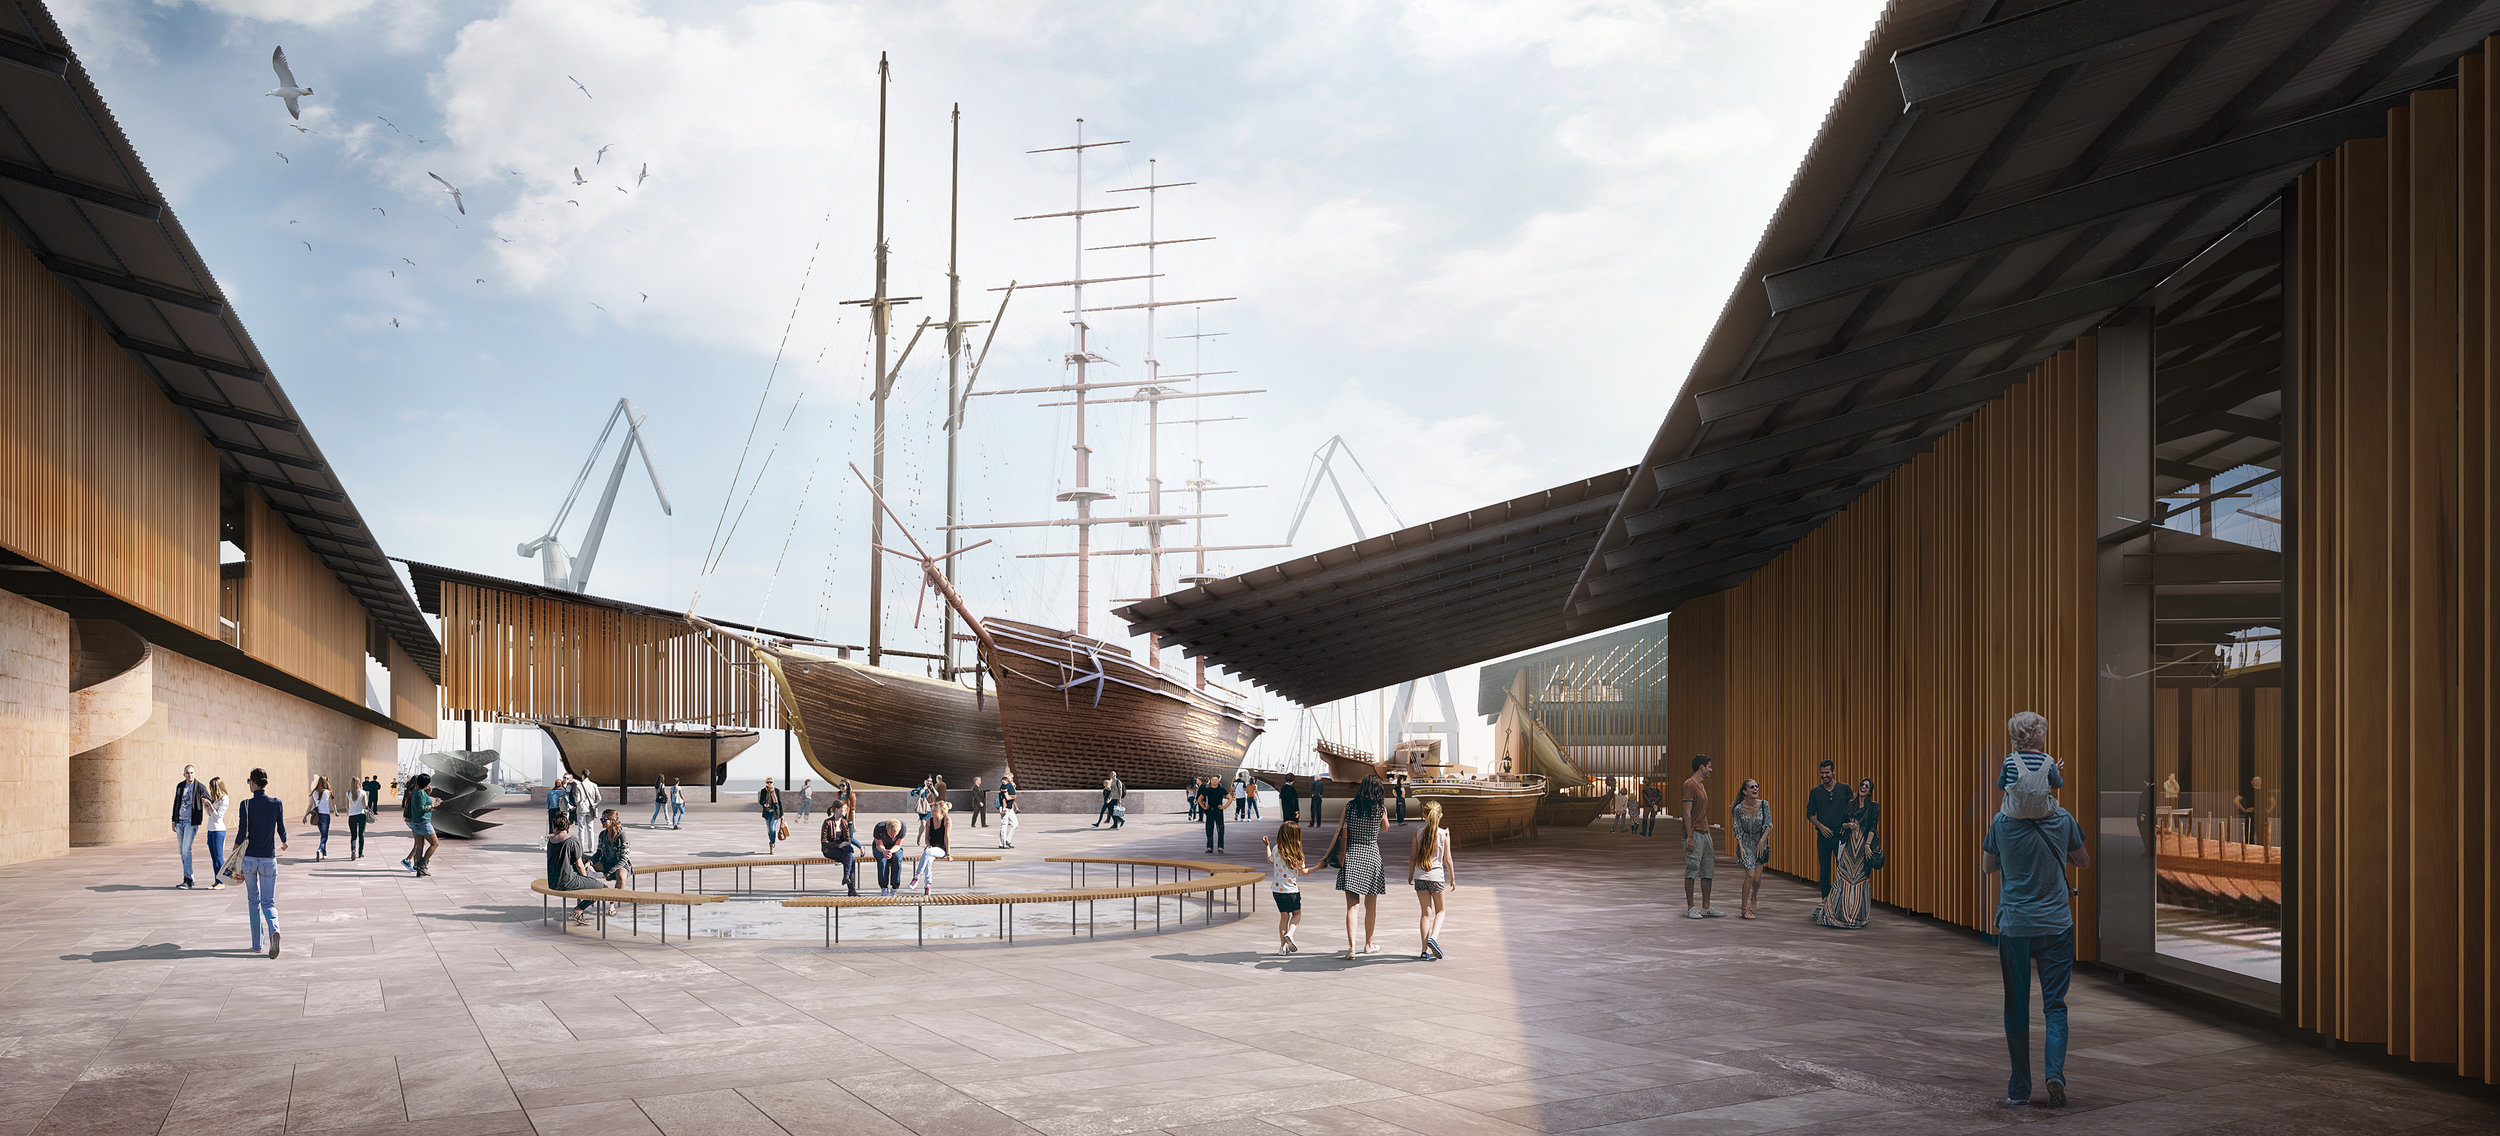 Patio del Museo Marítimo de Mallorca